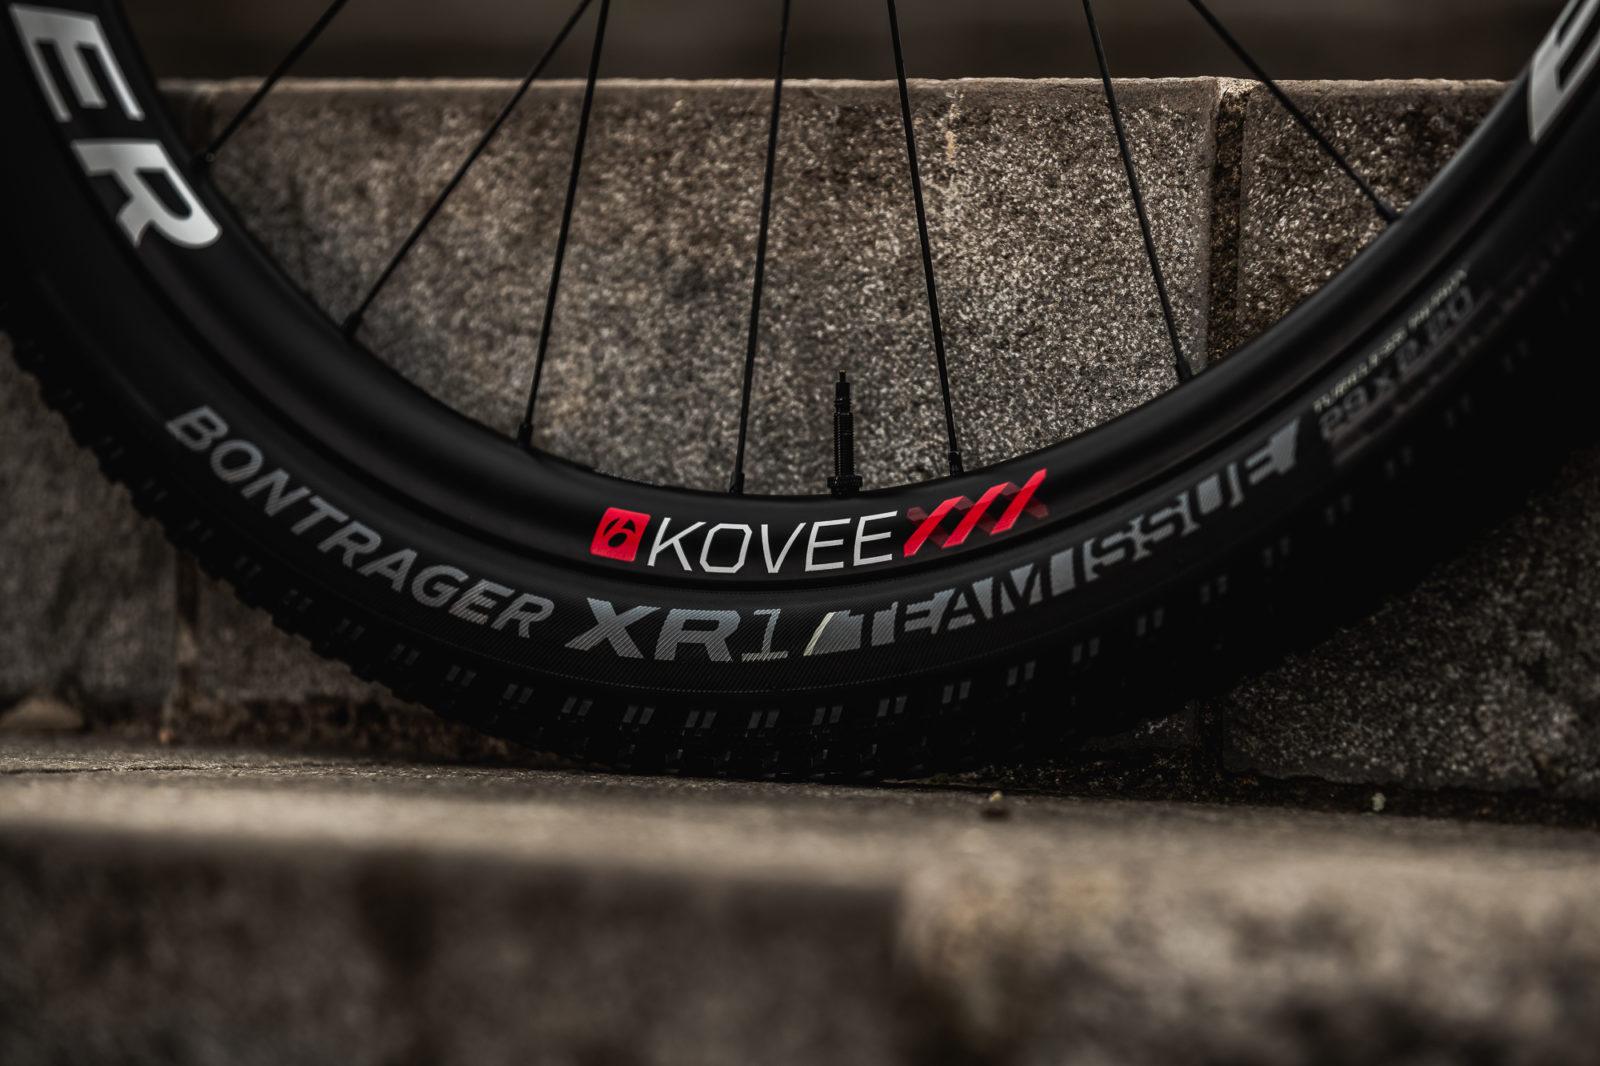 Bontrager Kovee Wheels